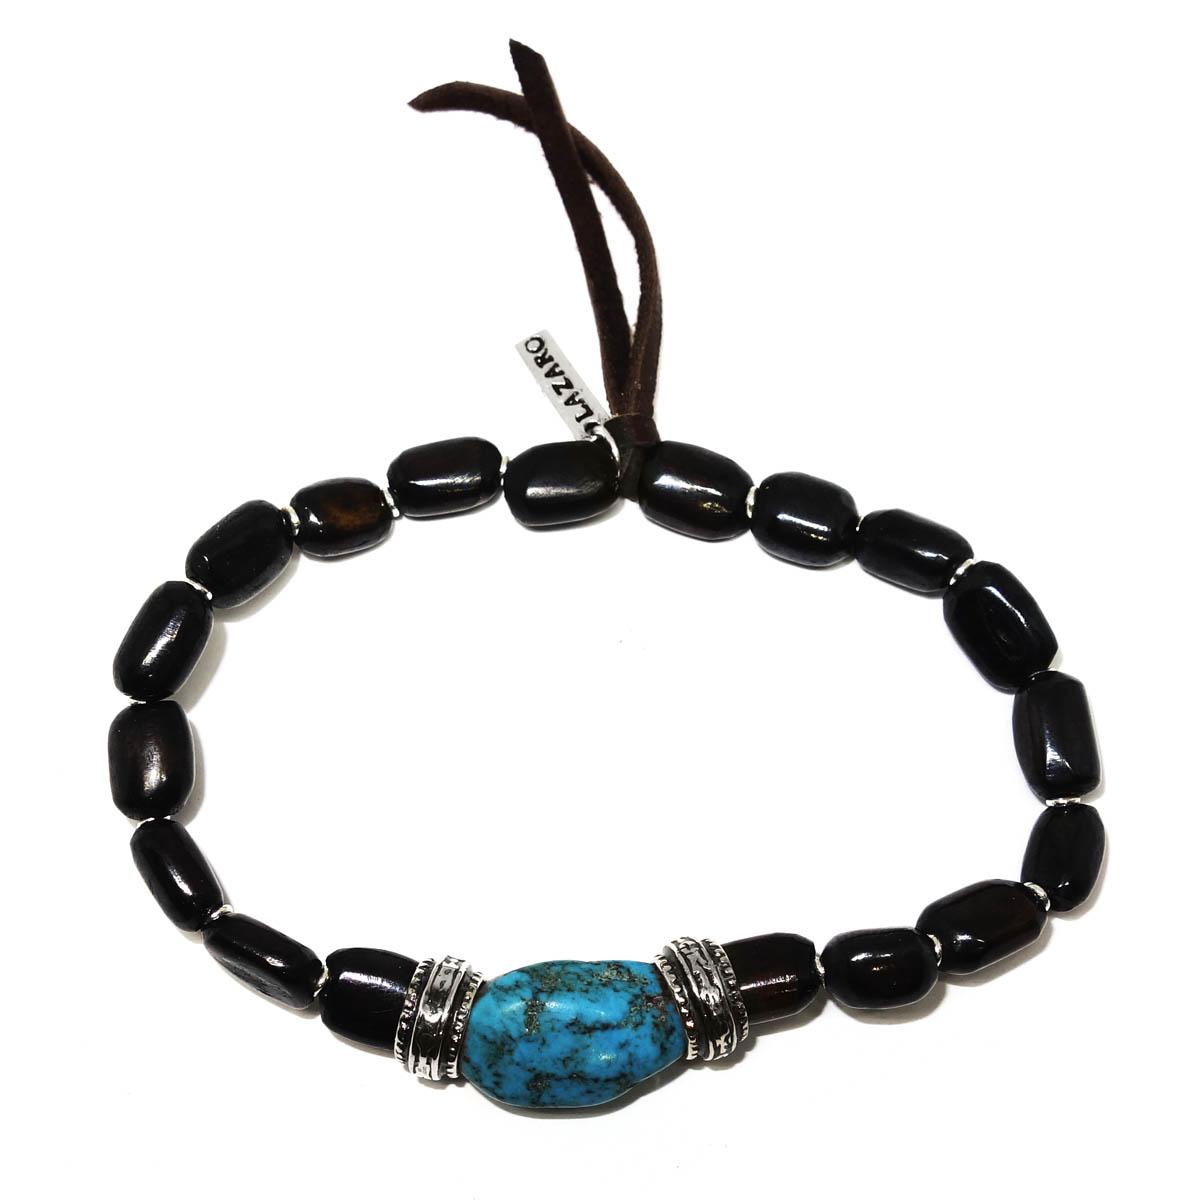 Turquoise Silver Wooden Bead Bracelet